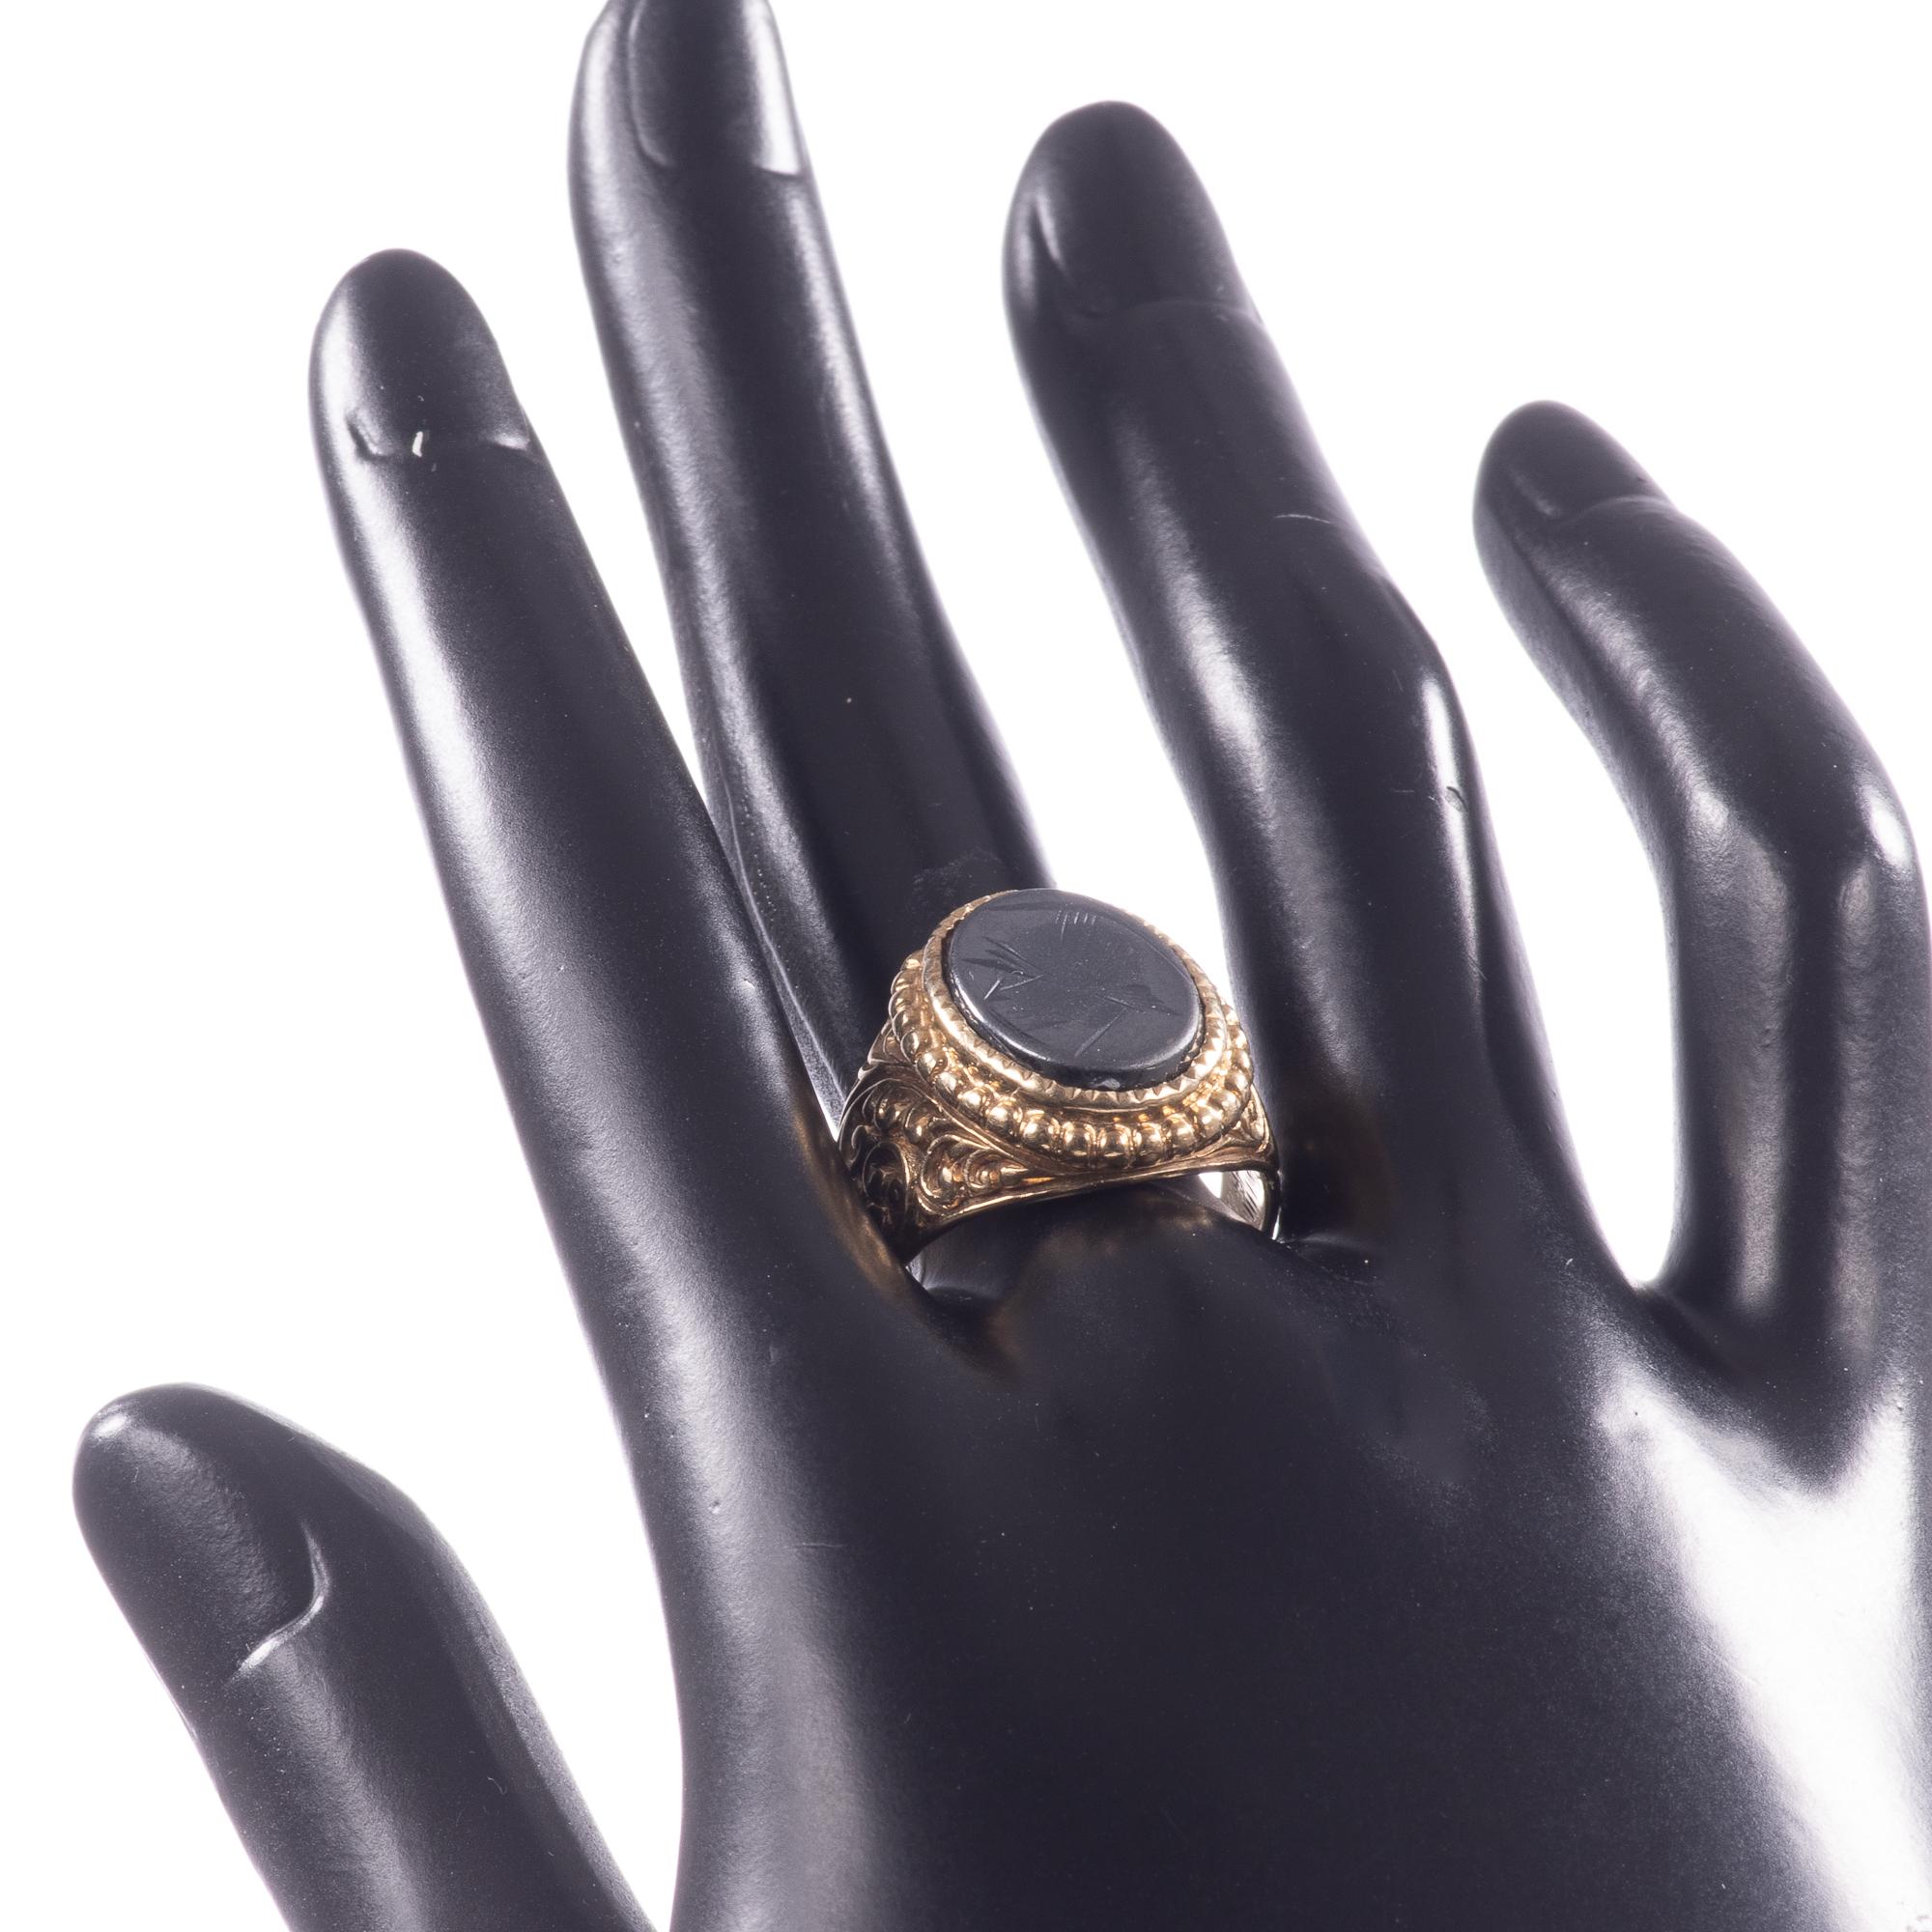 9ct Gold Centurion Onyx Signet Ring - Image 2 of 7